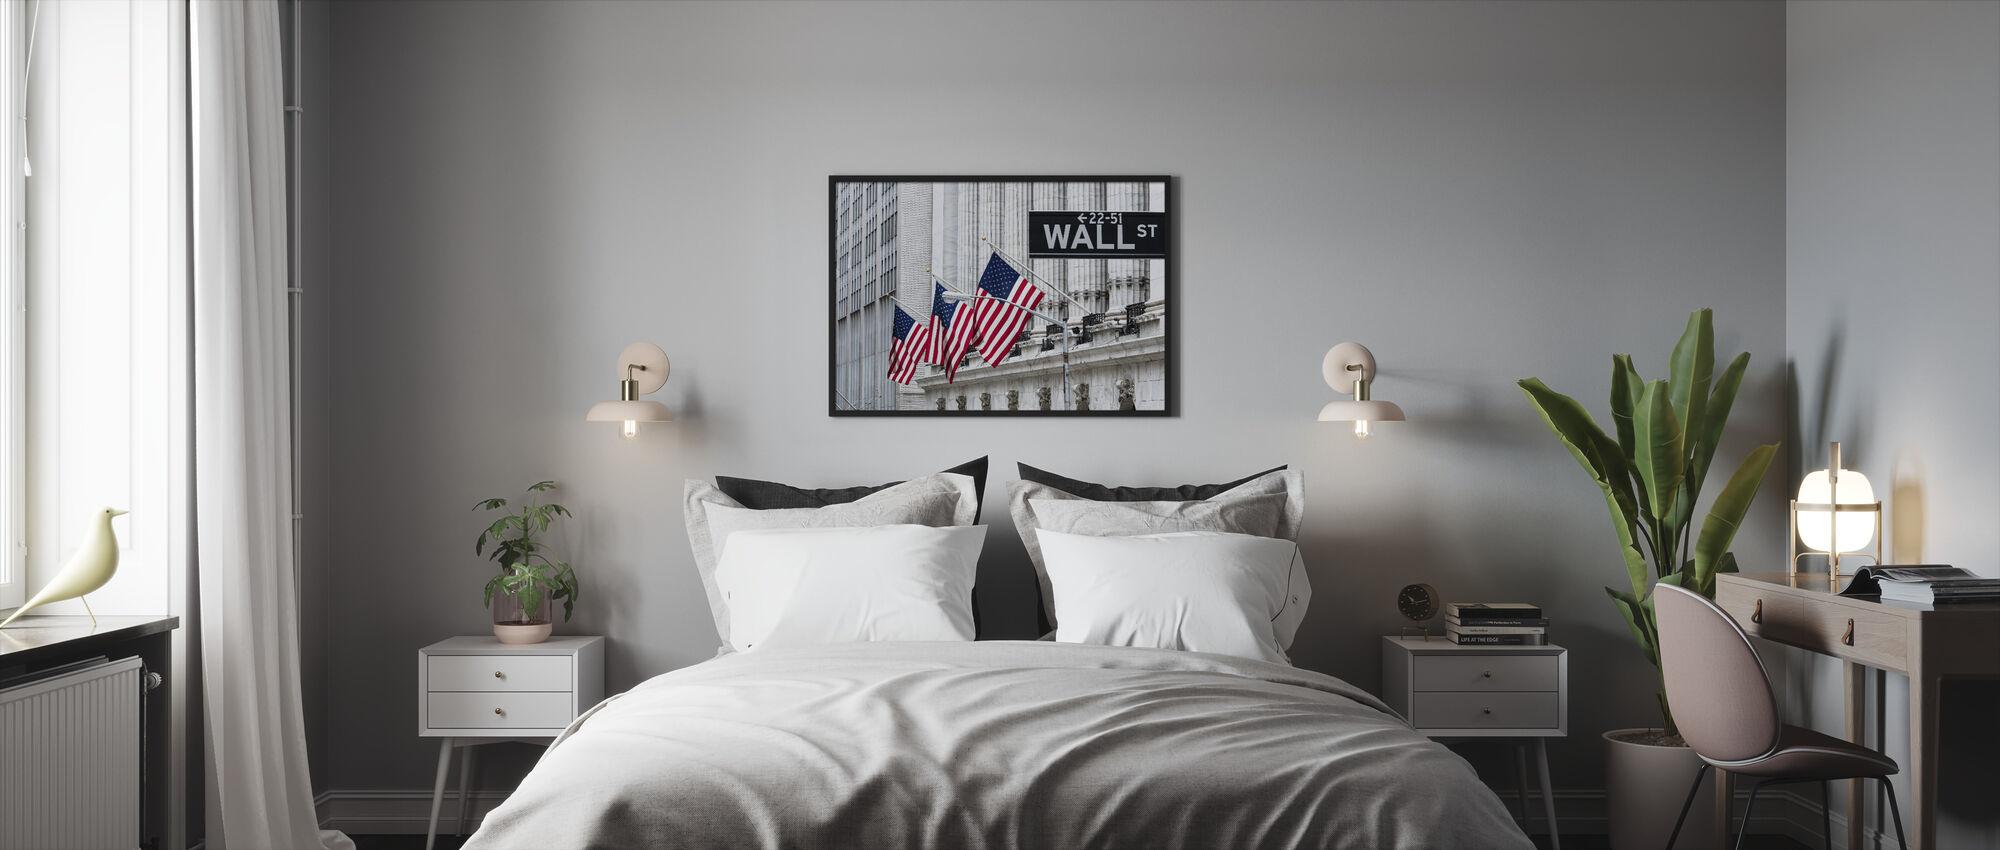 New York Wall Street - Innrammet bilde - Soverom